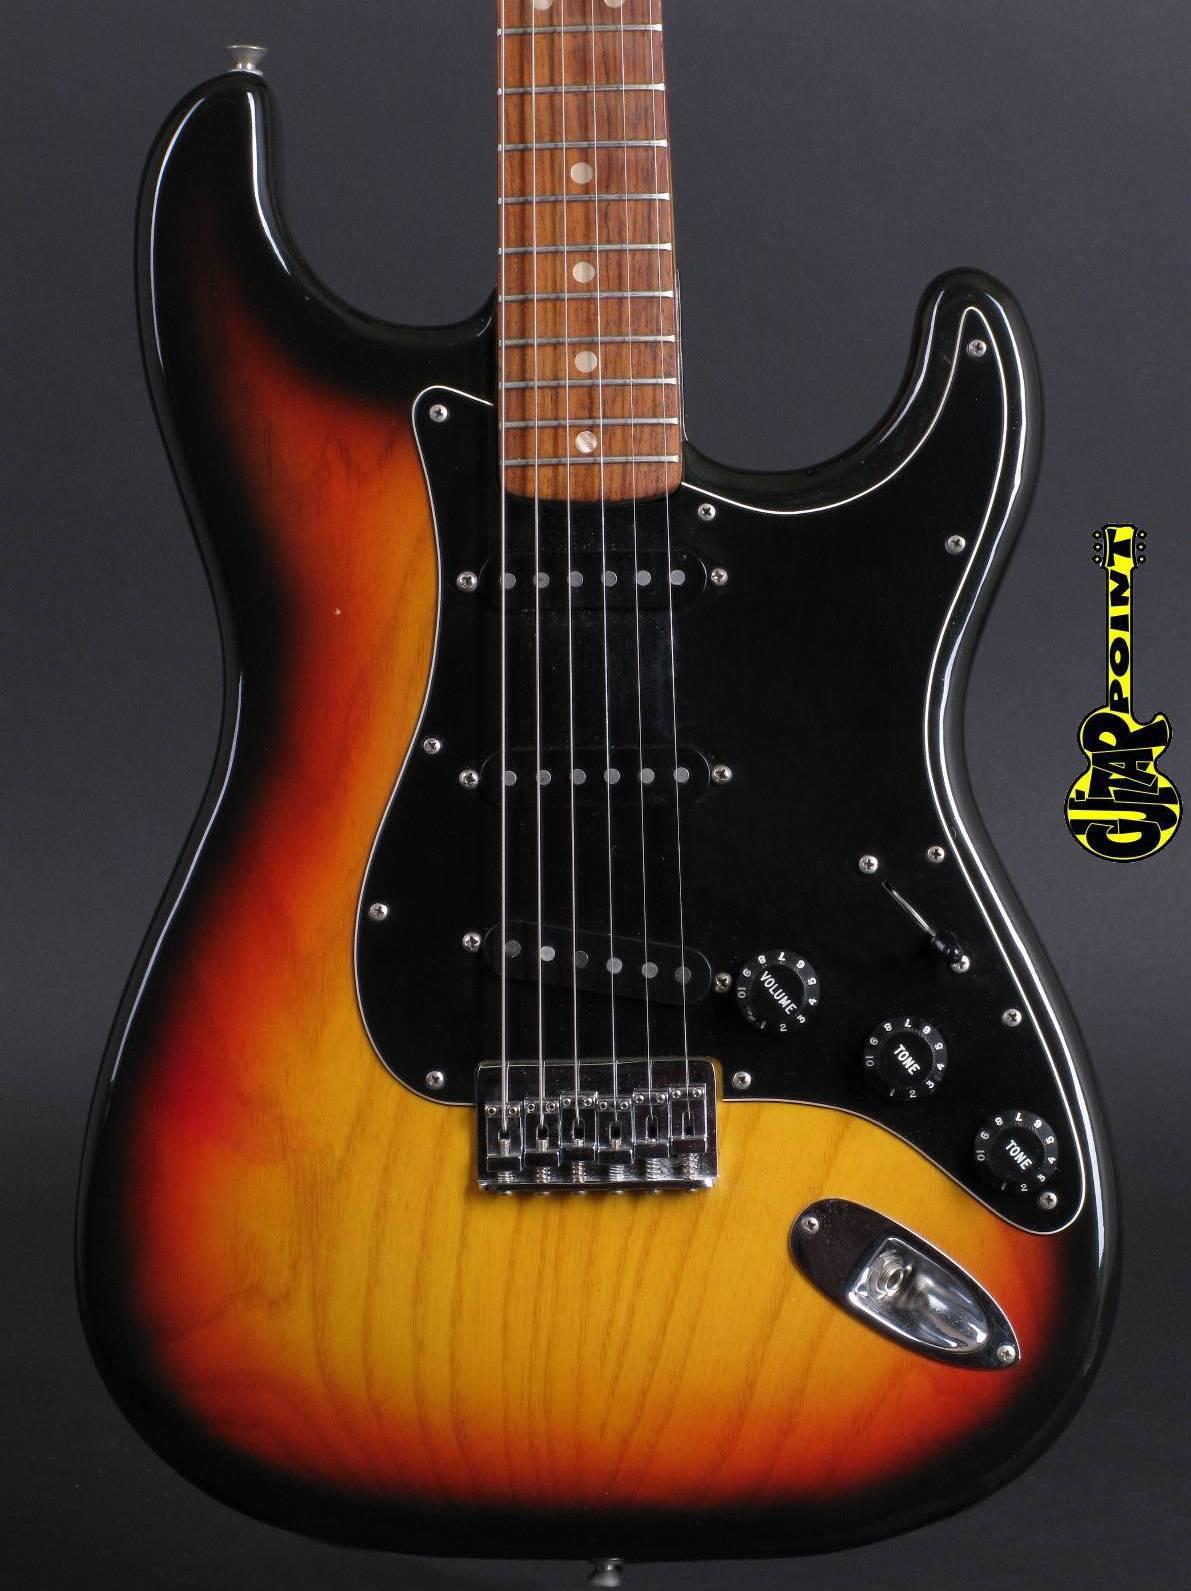 1977 Fender Stratocaster - 3t-Sunburst / Mint incl. hangtags!